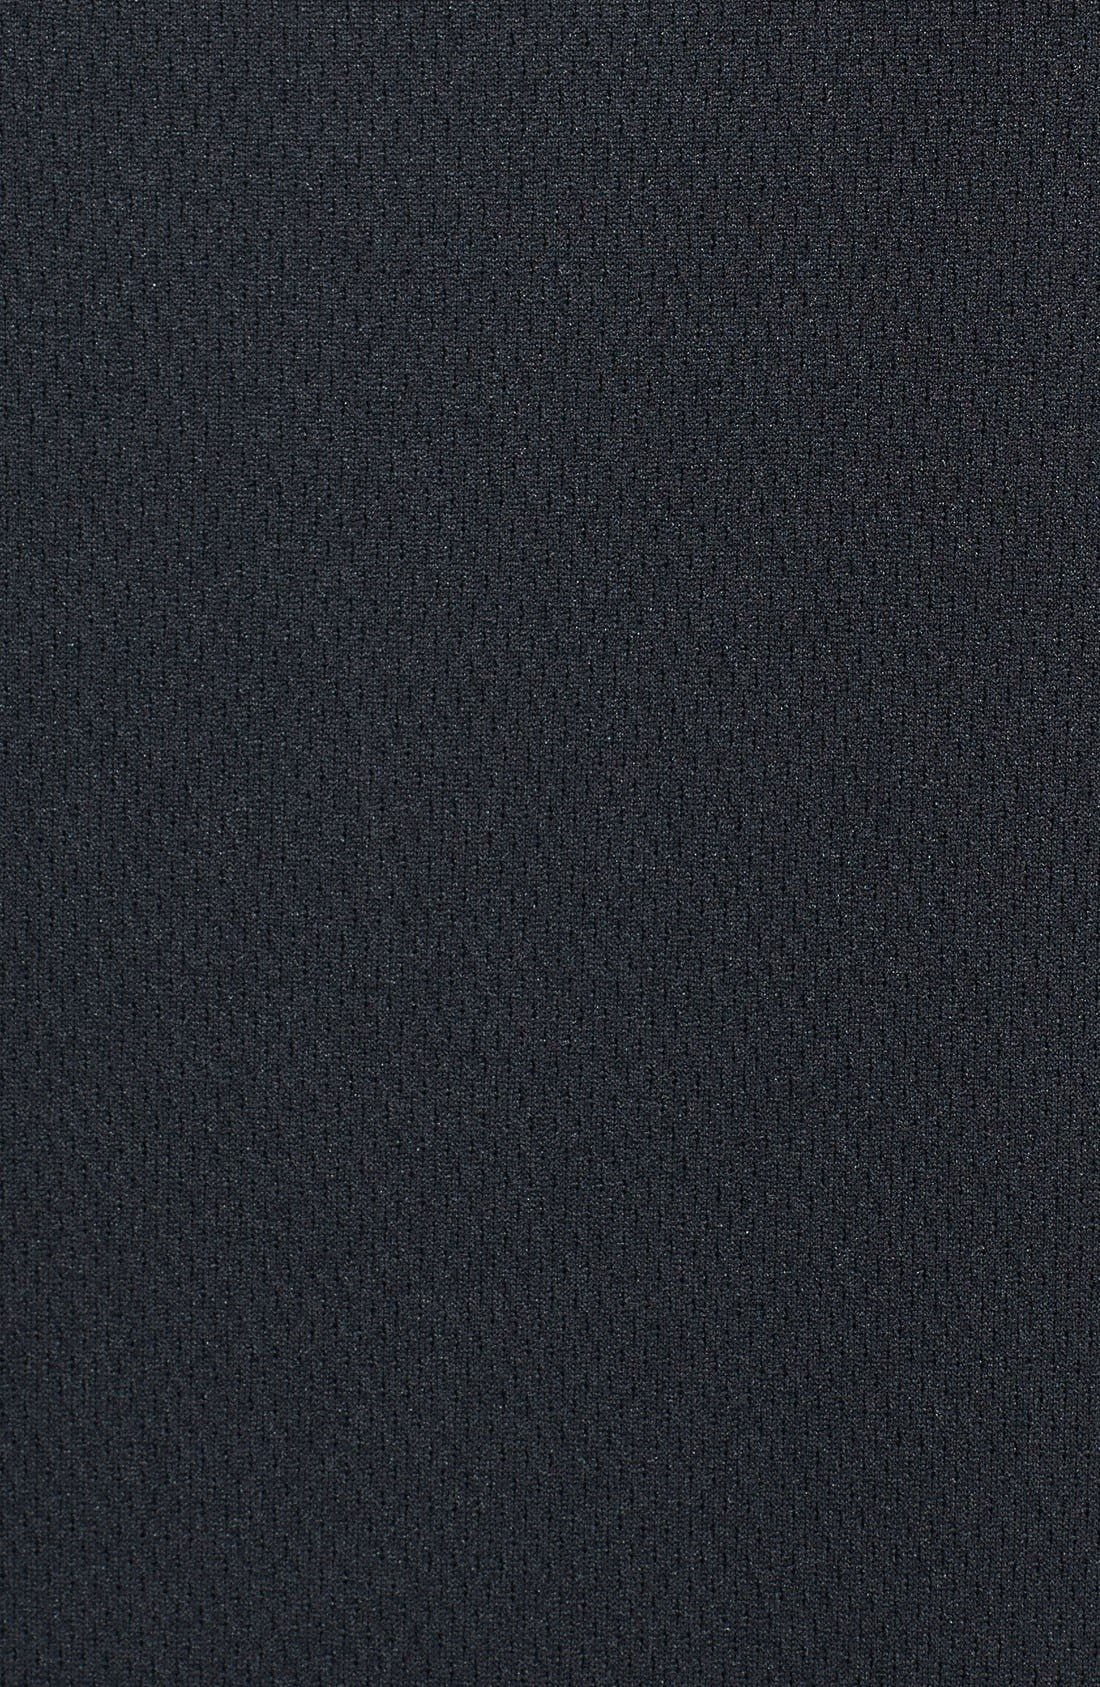 Arizona Cardinals - Edge DryTec Moisture Wicking Half Zip Pullover,                             Alternate thumbnail 3, color,                             Black